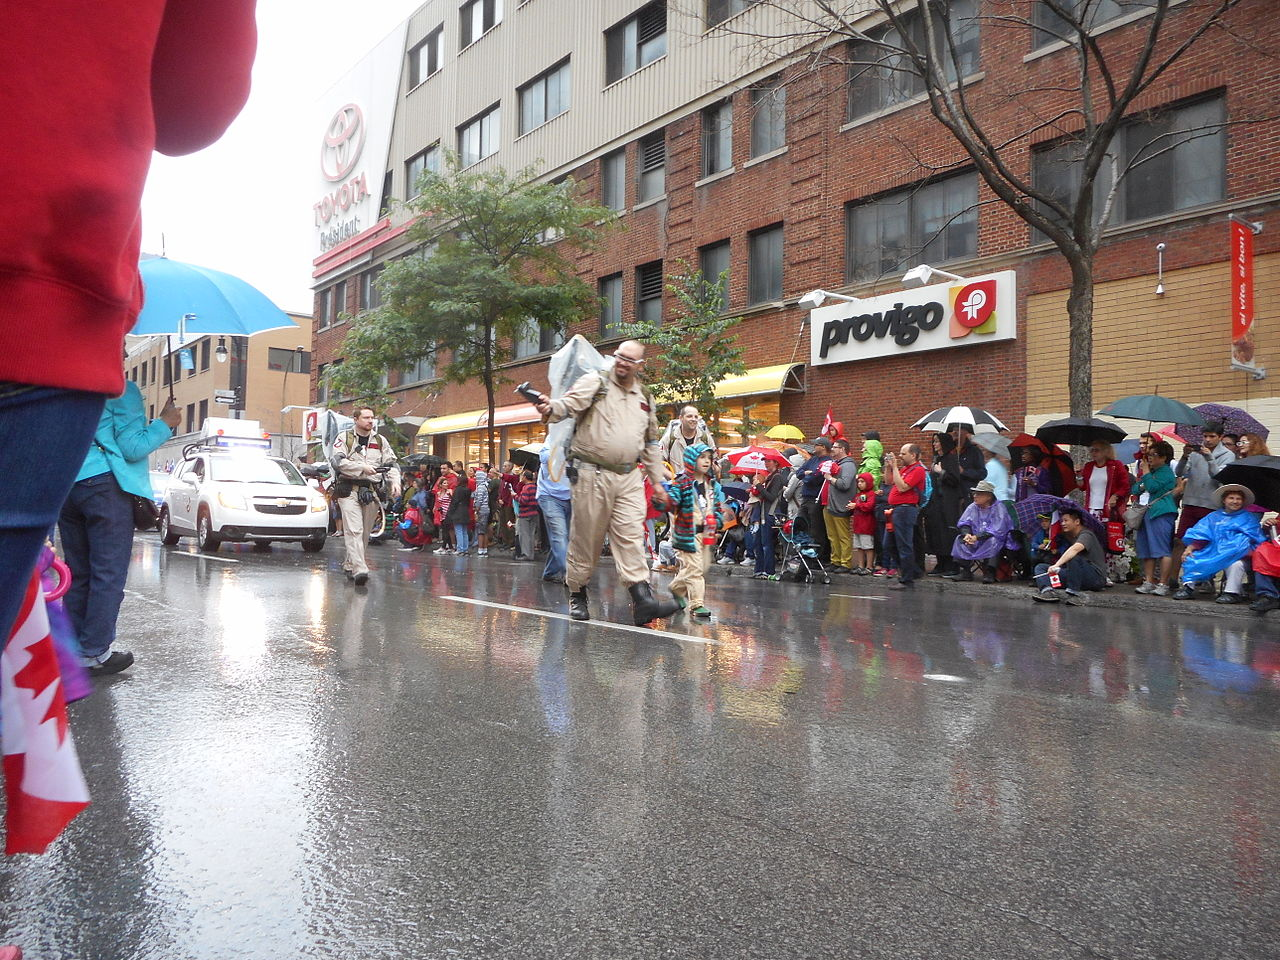 File:Canada Day 2015 on Saint Catherine Street - 183.jpg - Wikimedia